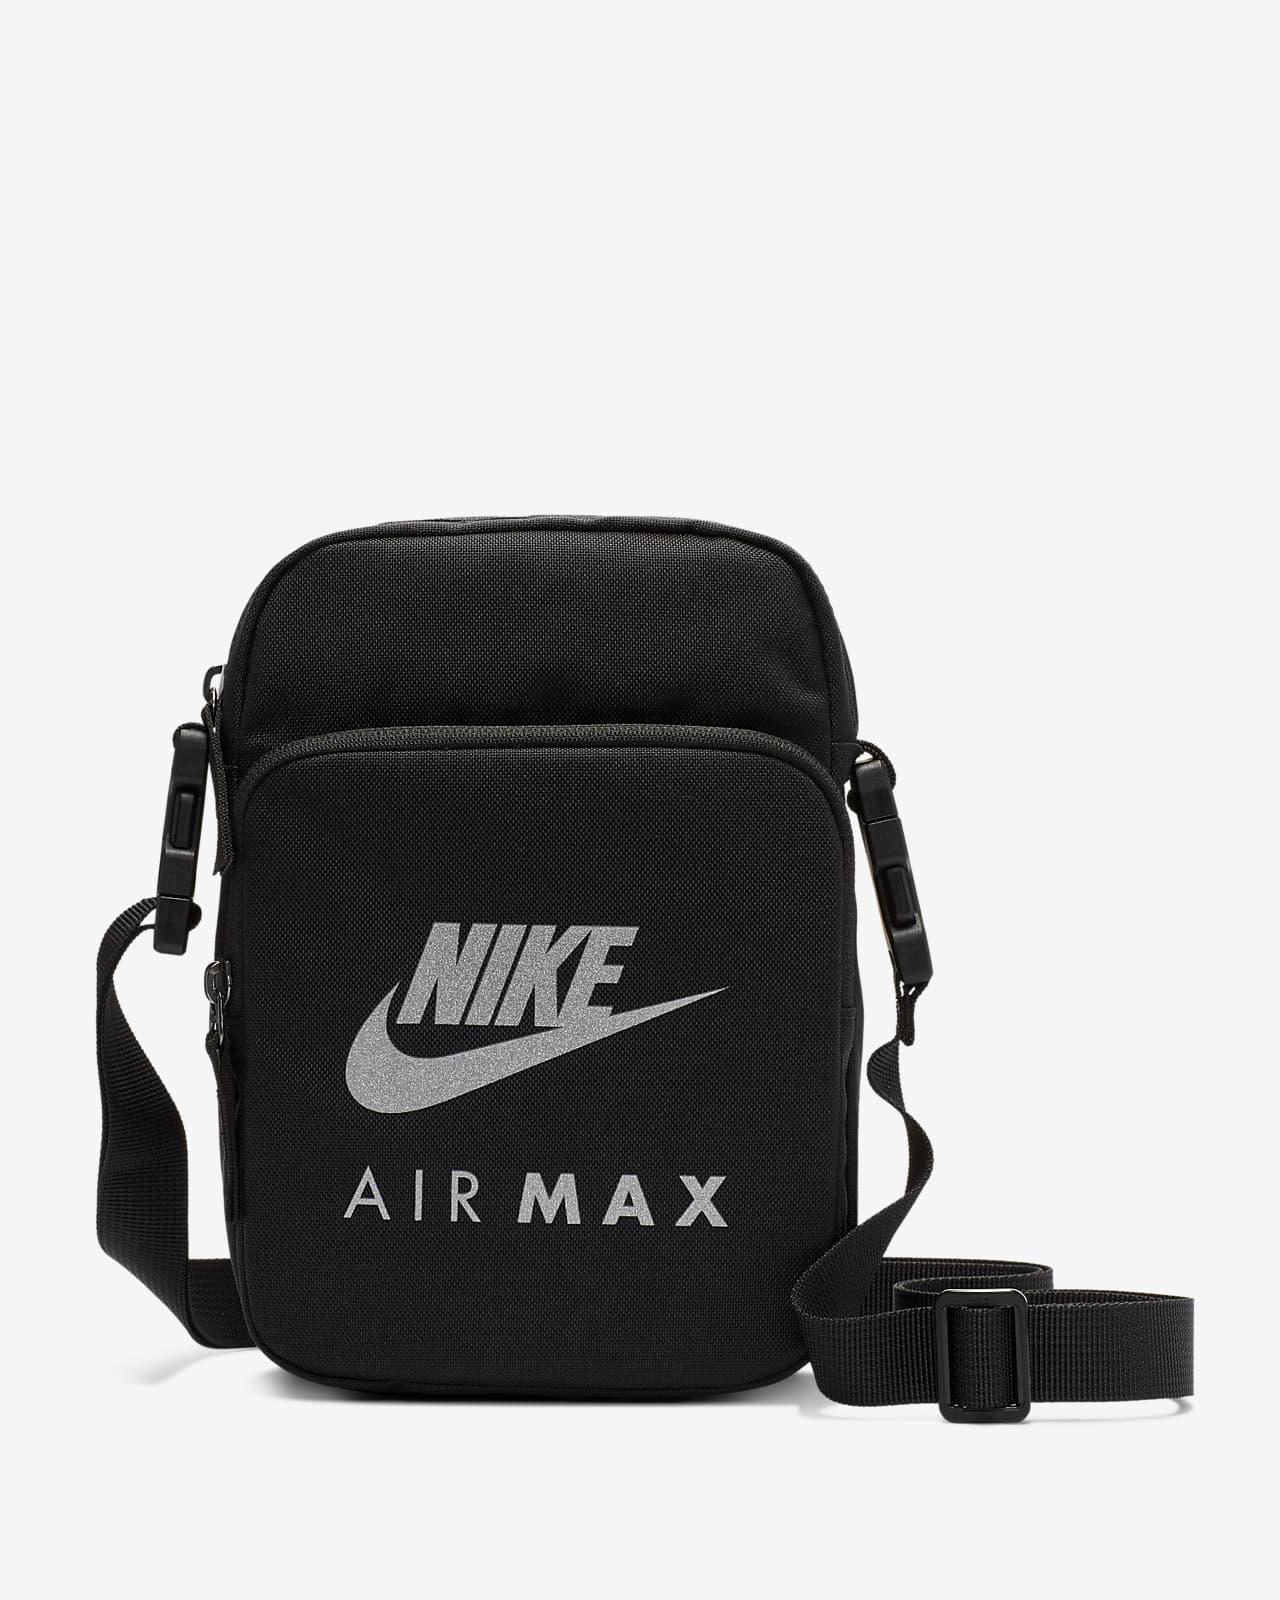 Nike Air Max 2.0 Cross-Body Bag (Small